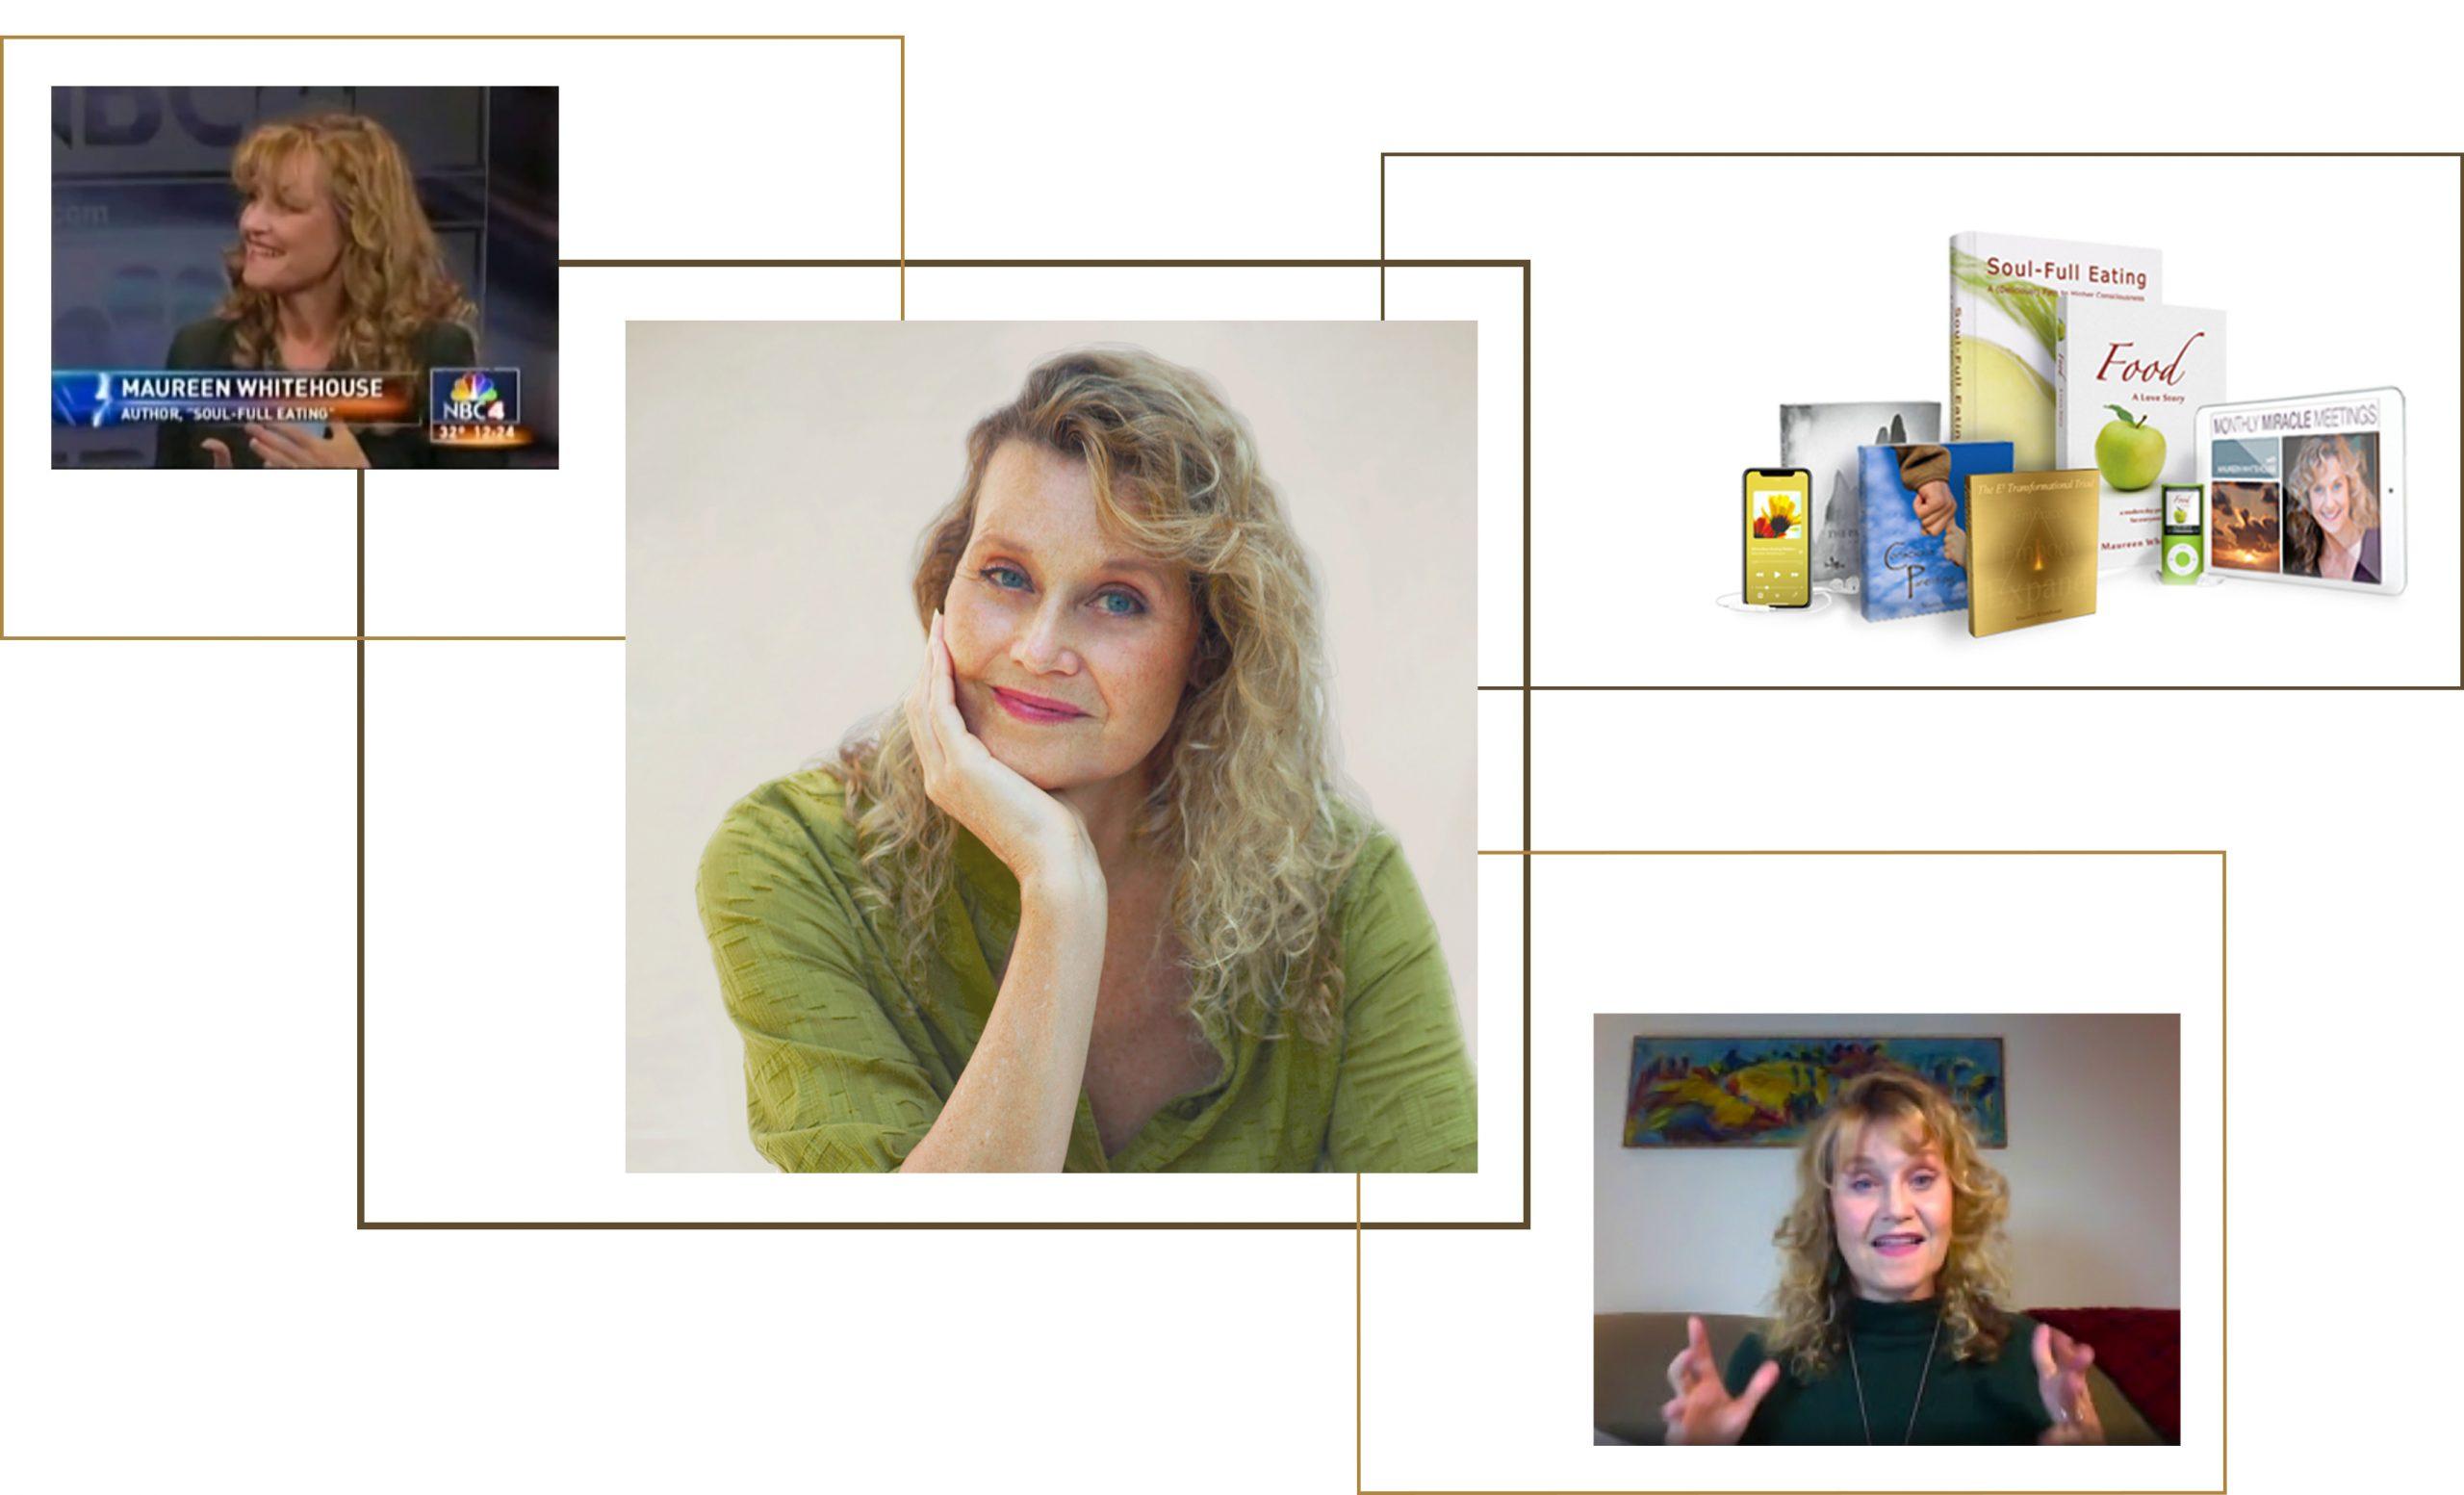 Miracle Mentor and Spiritual Teacher Maureen Whitehouse